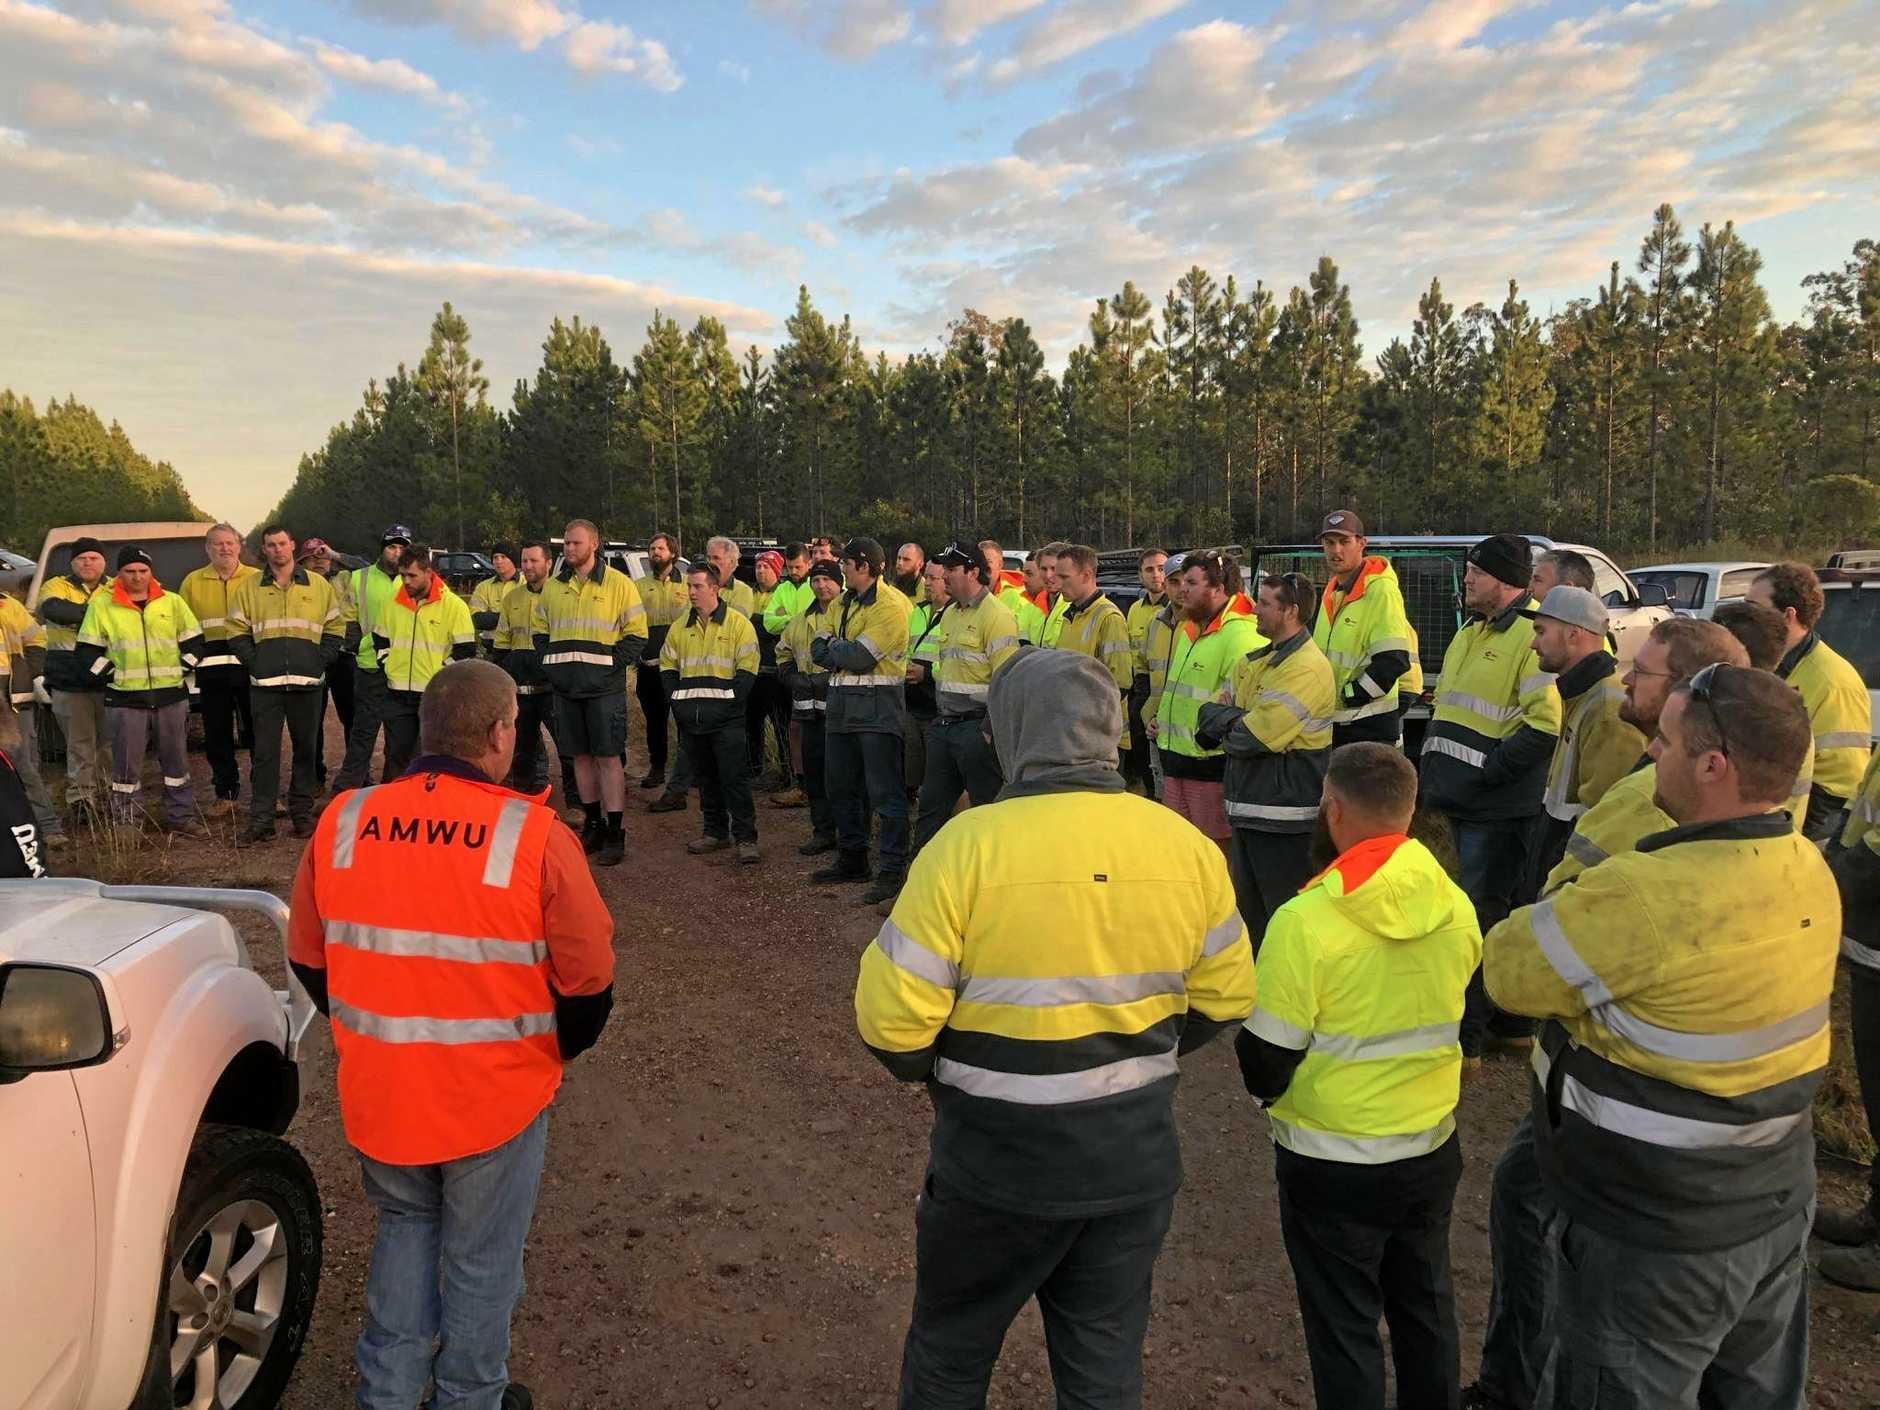 Hyne Timber employees striking today